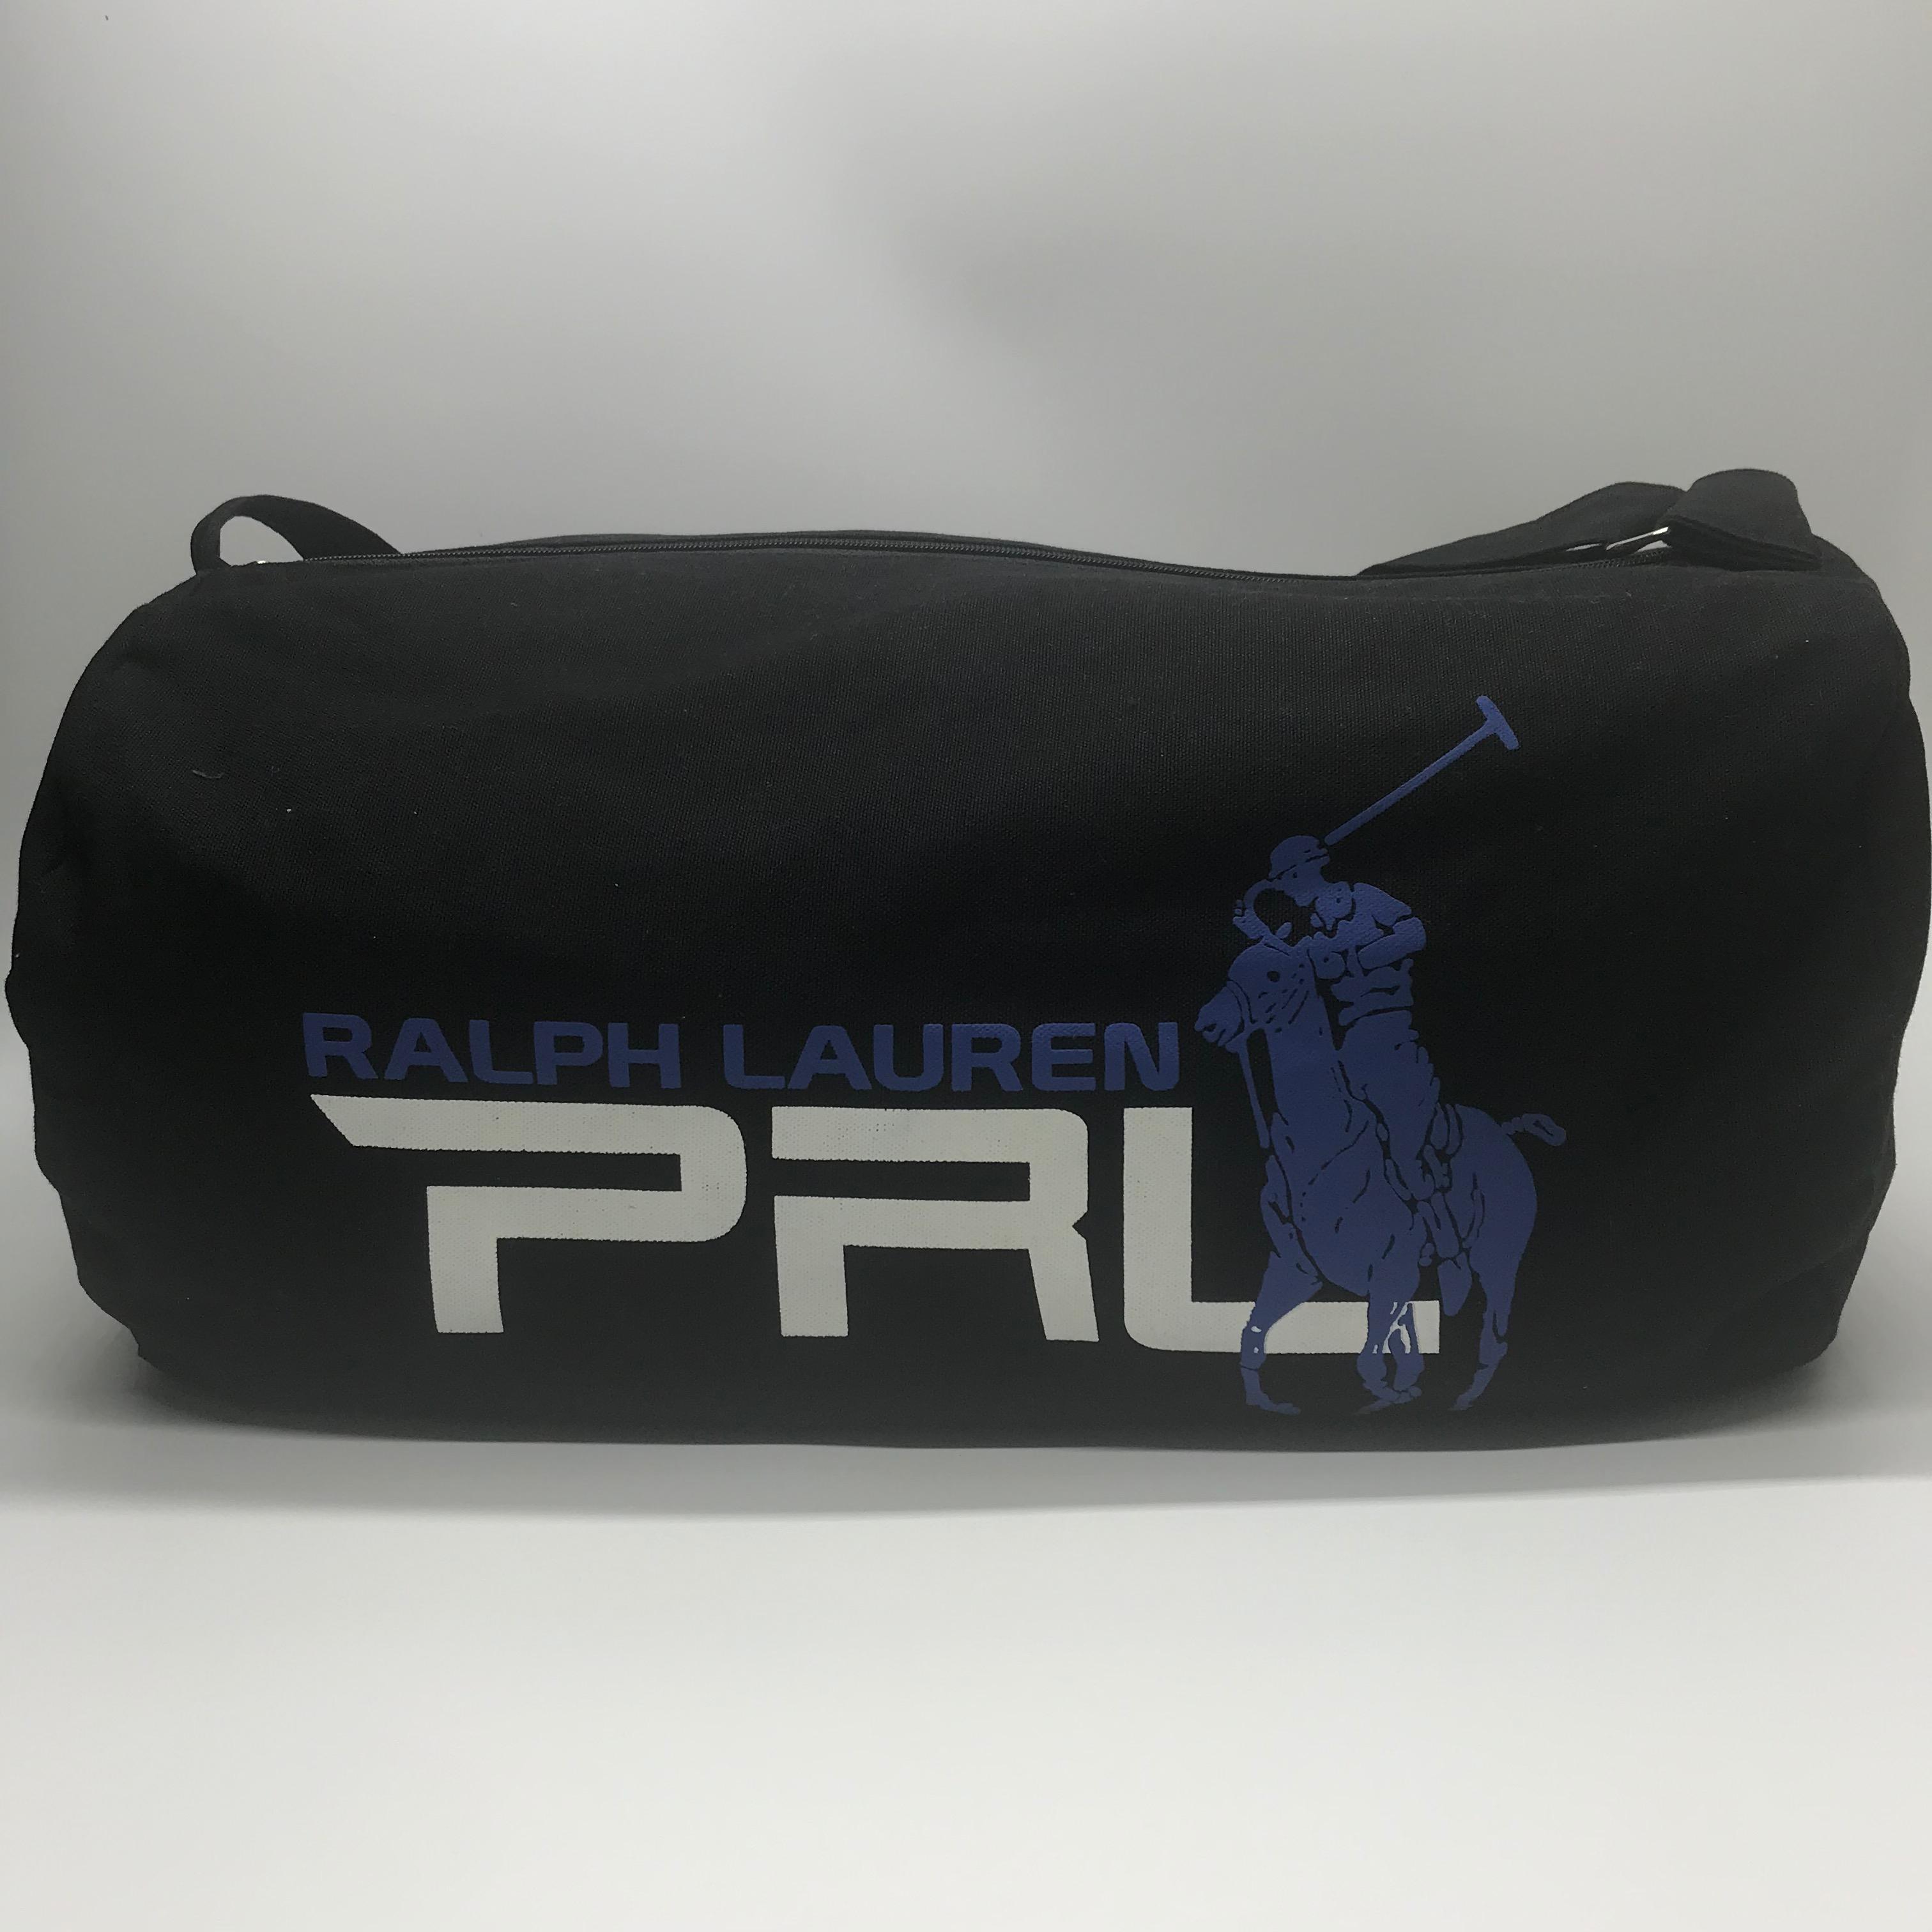 Bolsa Ralph Lauren image